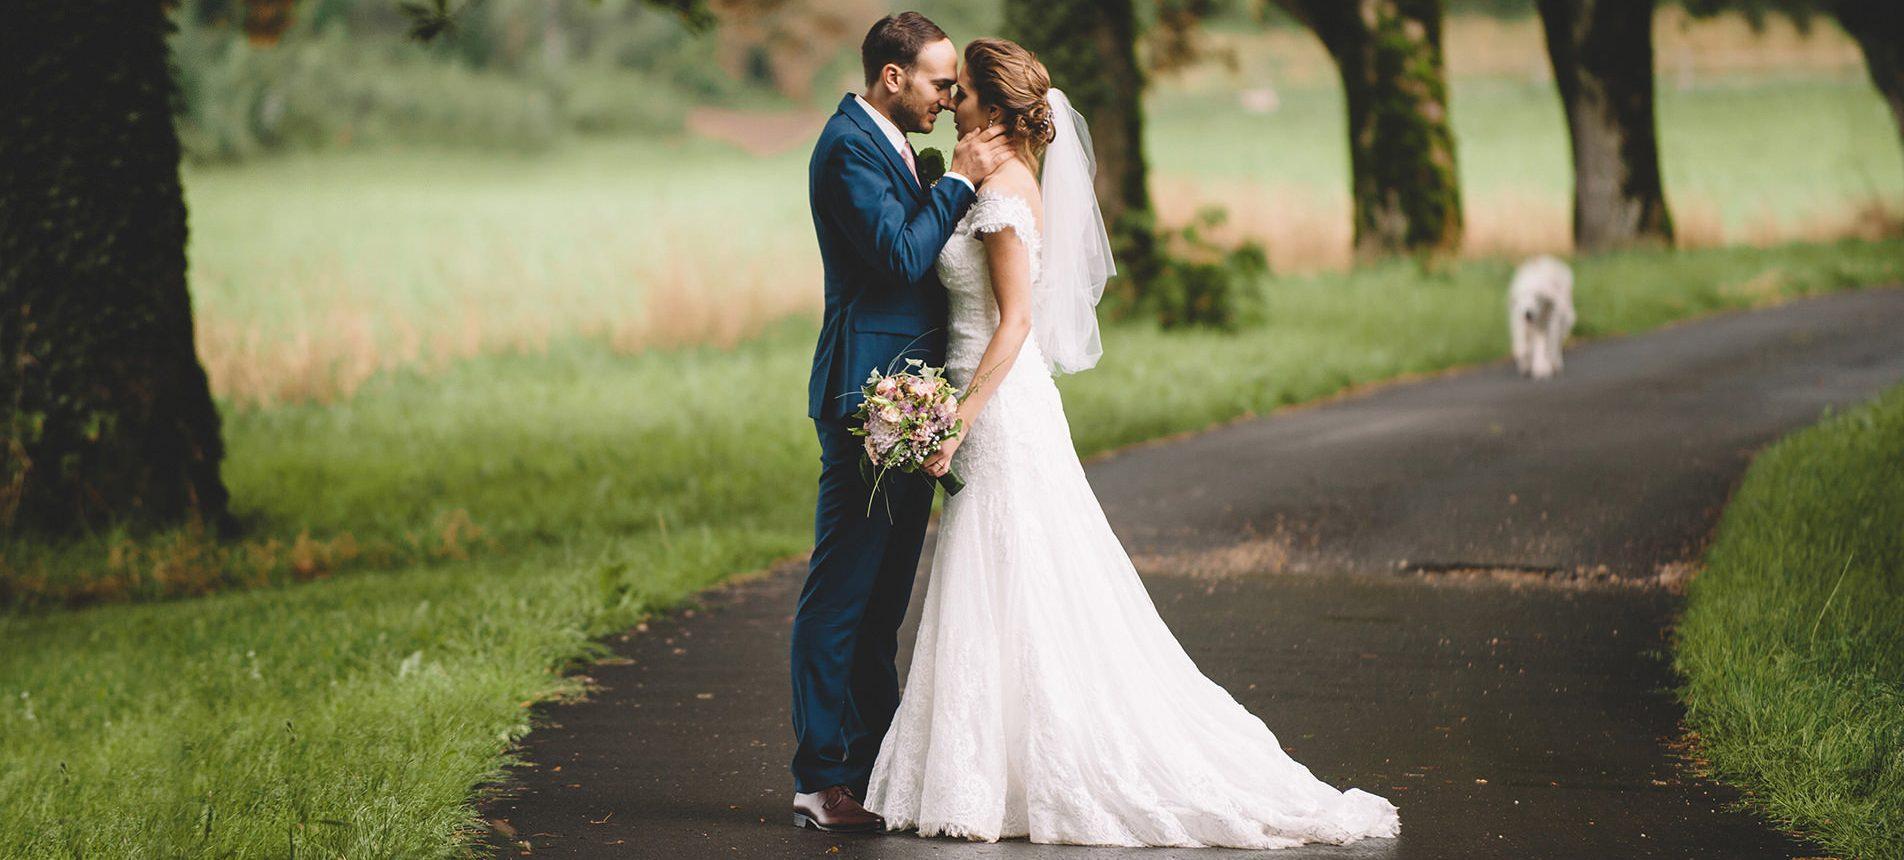 photographe-mariage-suisse monika breitenmoser-mariage-champêtre-lausanne